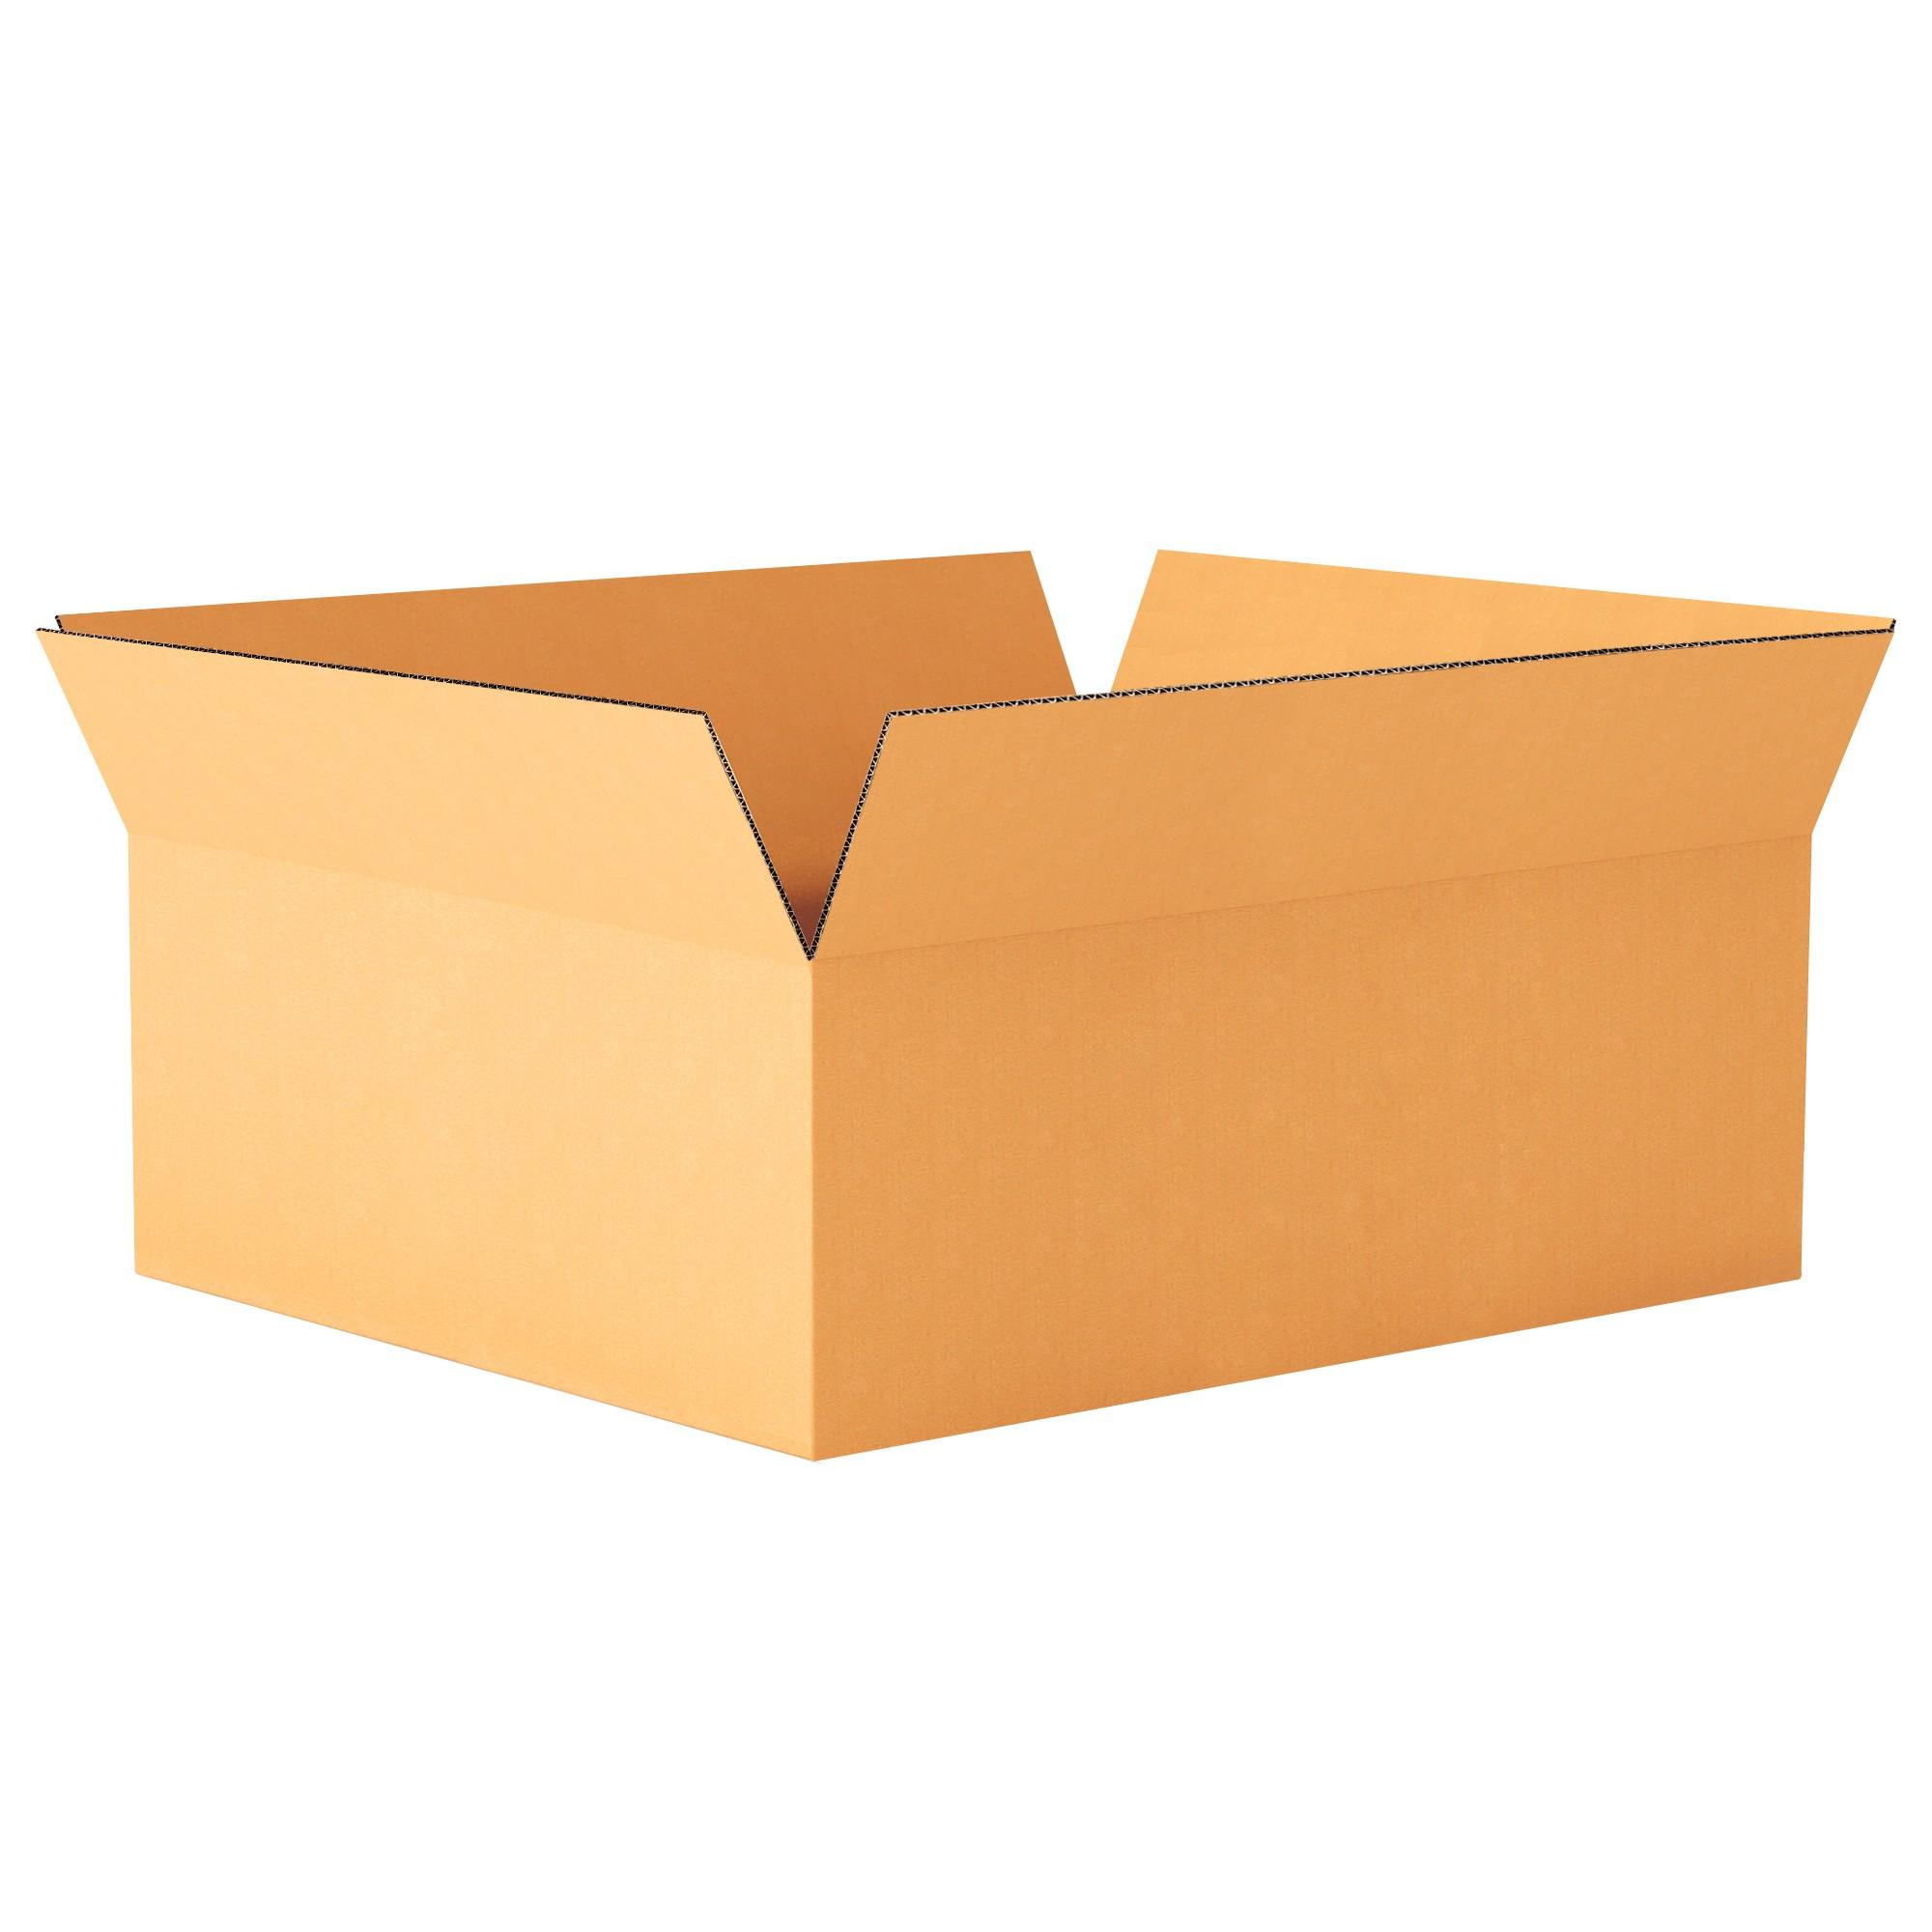 "TOTALPACK® 24 x 16 3/4 x 12"" Single Wall Corrugated UPS 84 Boxes 15 Units"